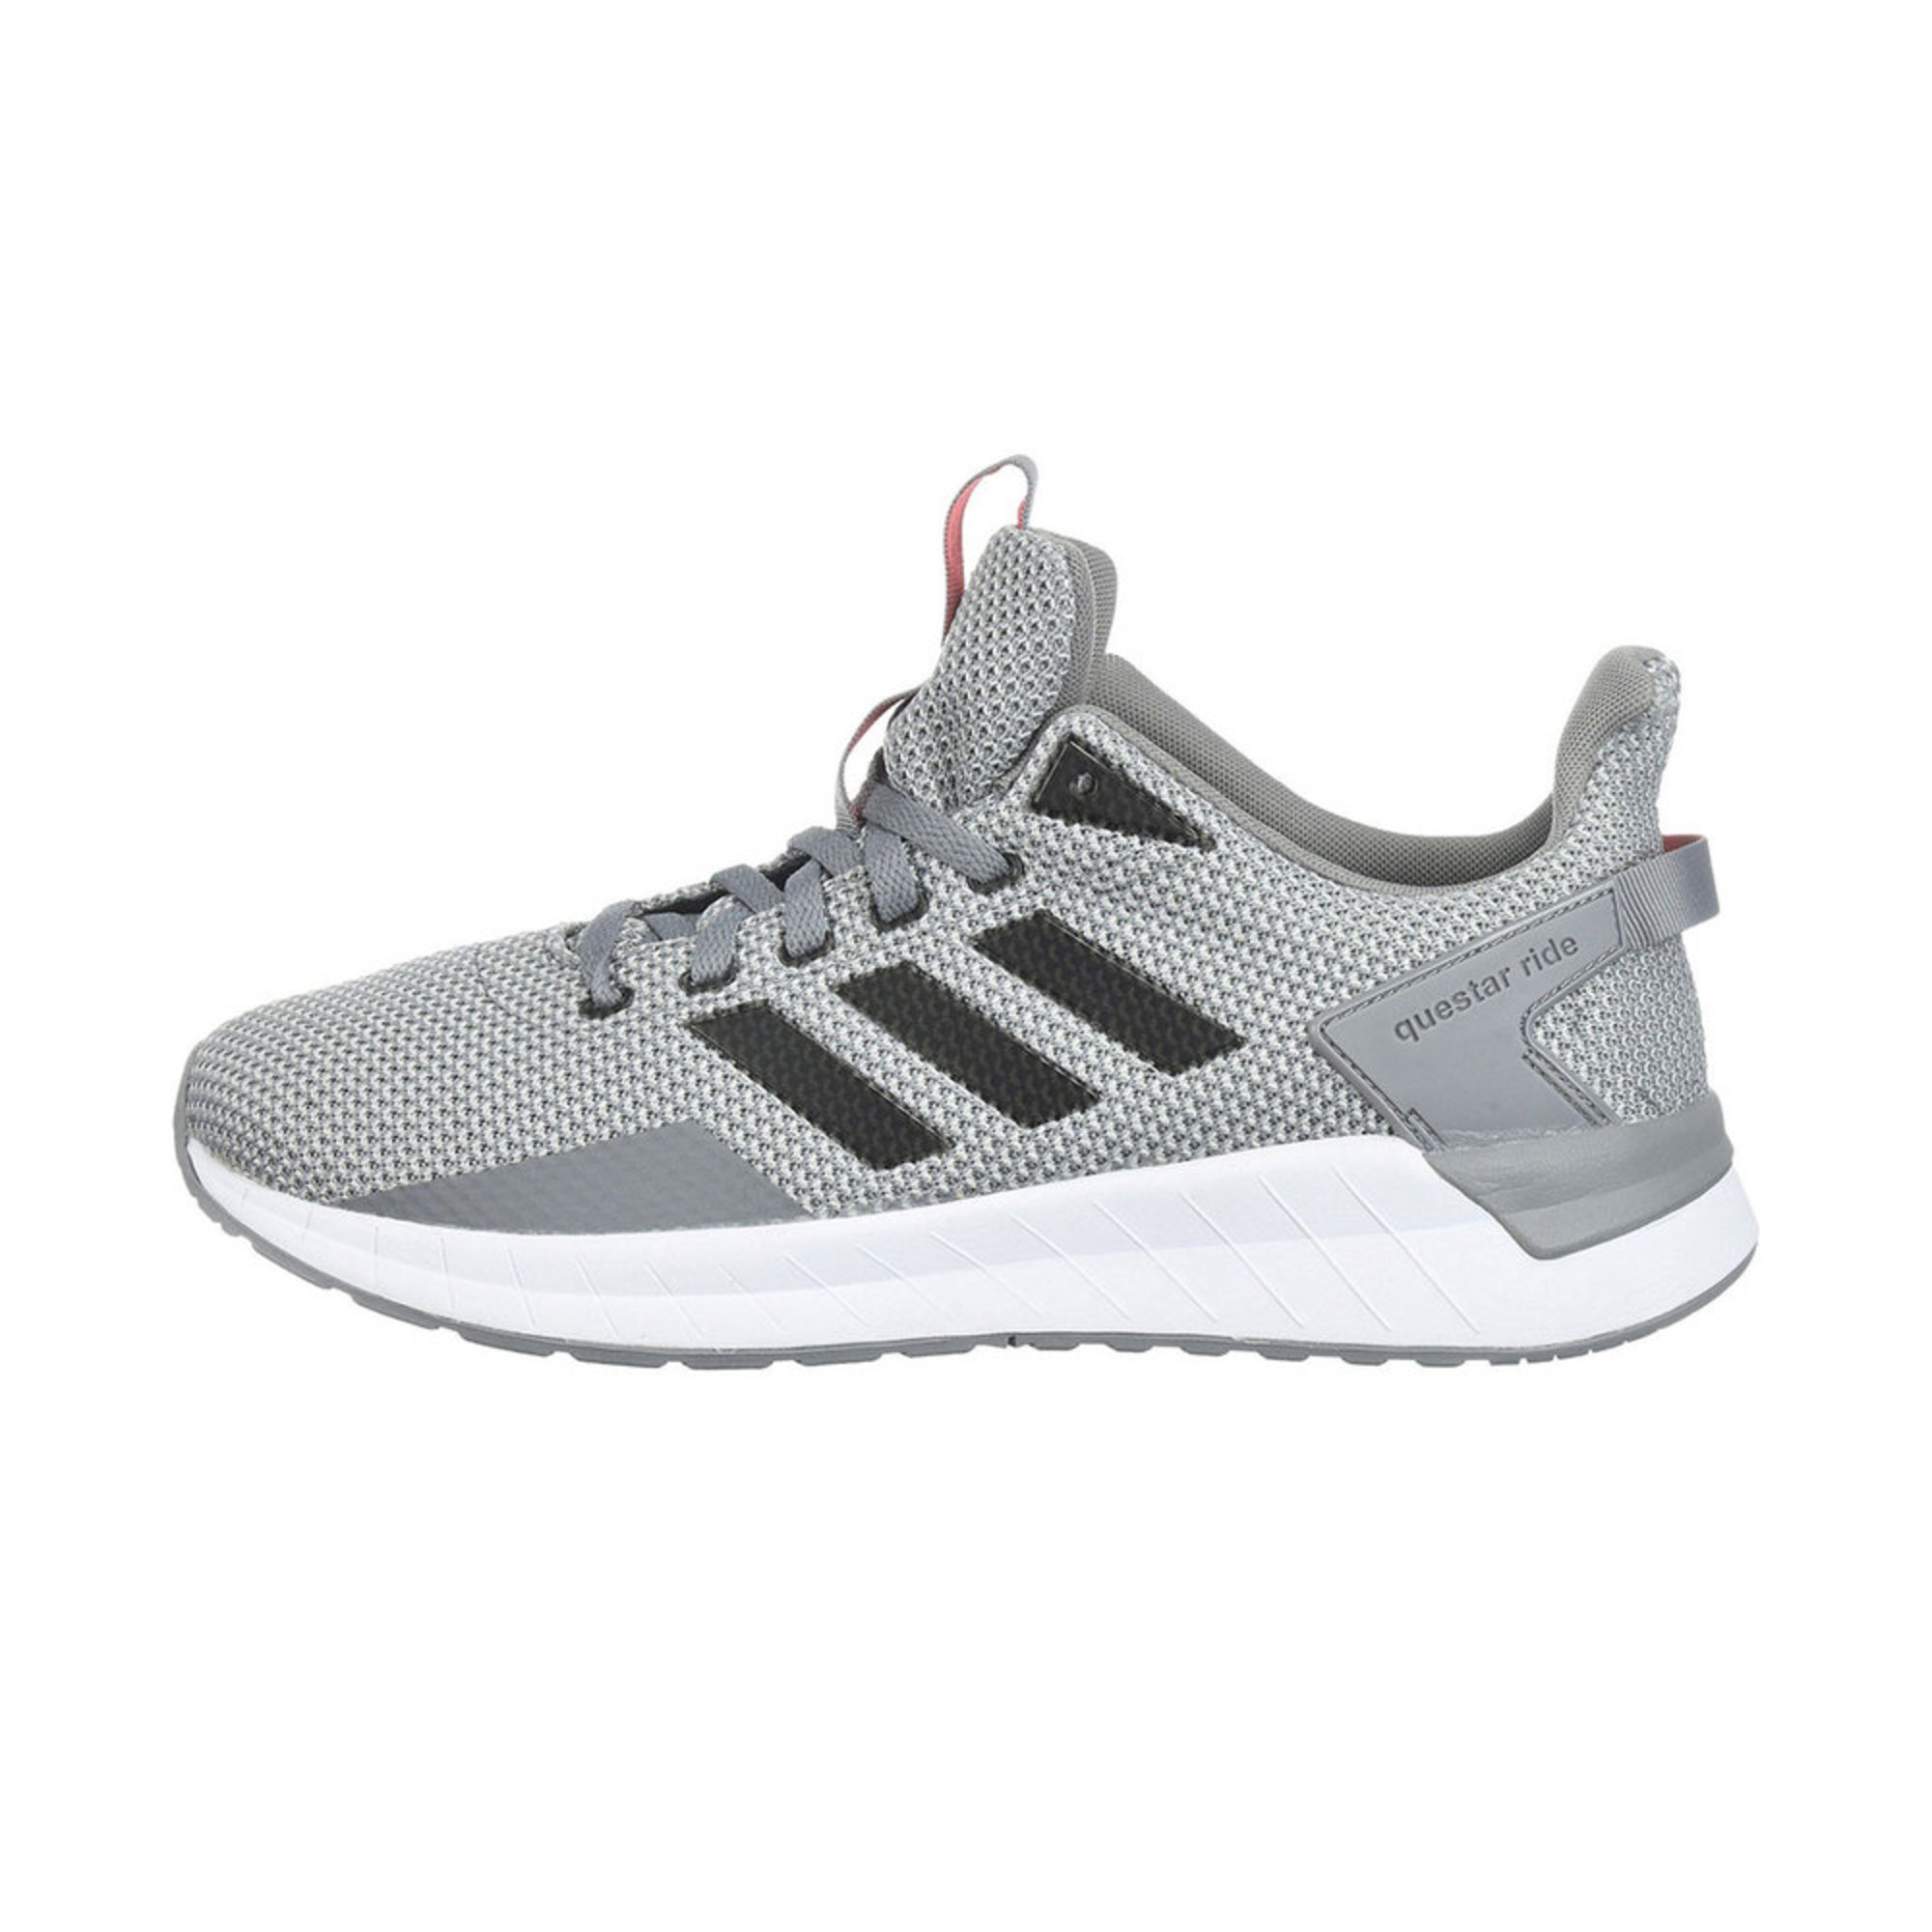 adidas. Adidas Men s Questar Ride Running Shoe b9958e0b6